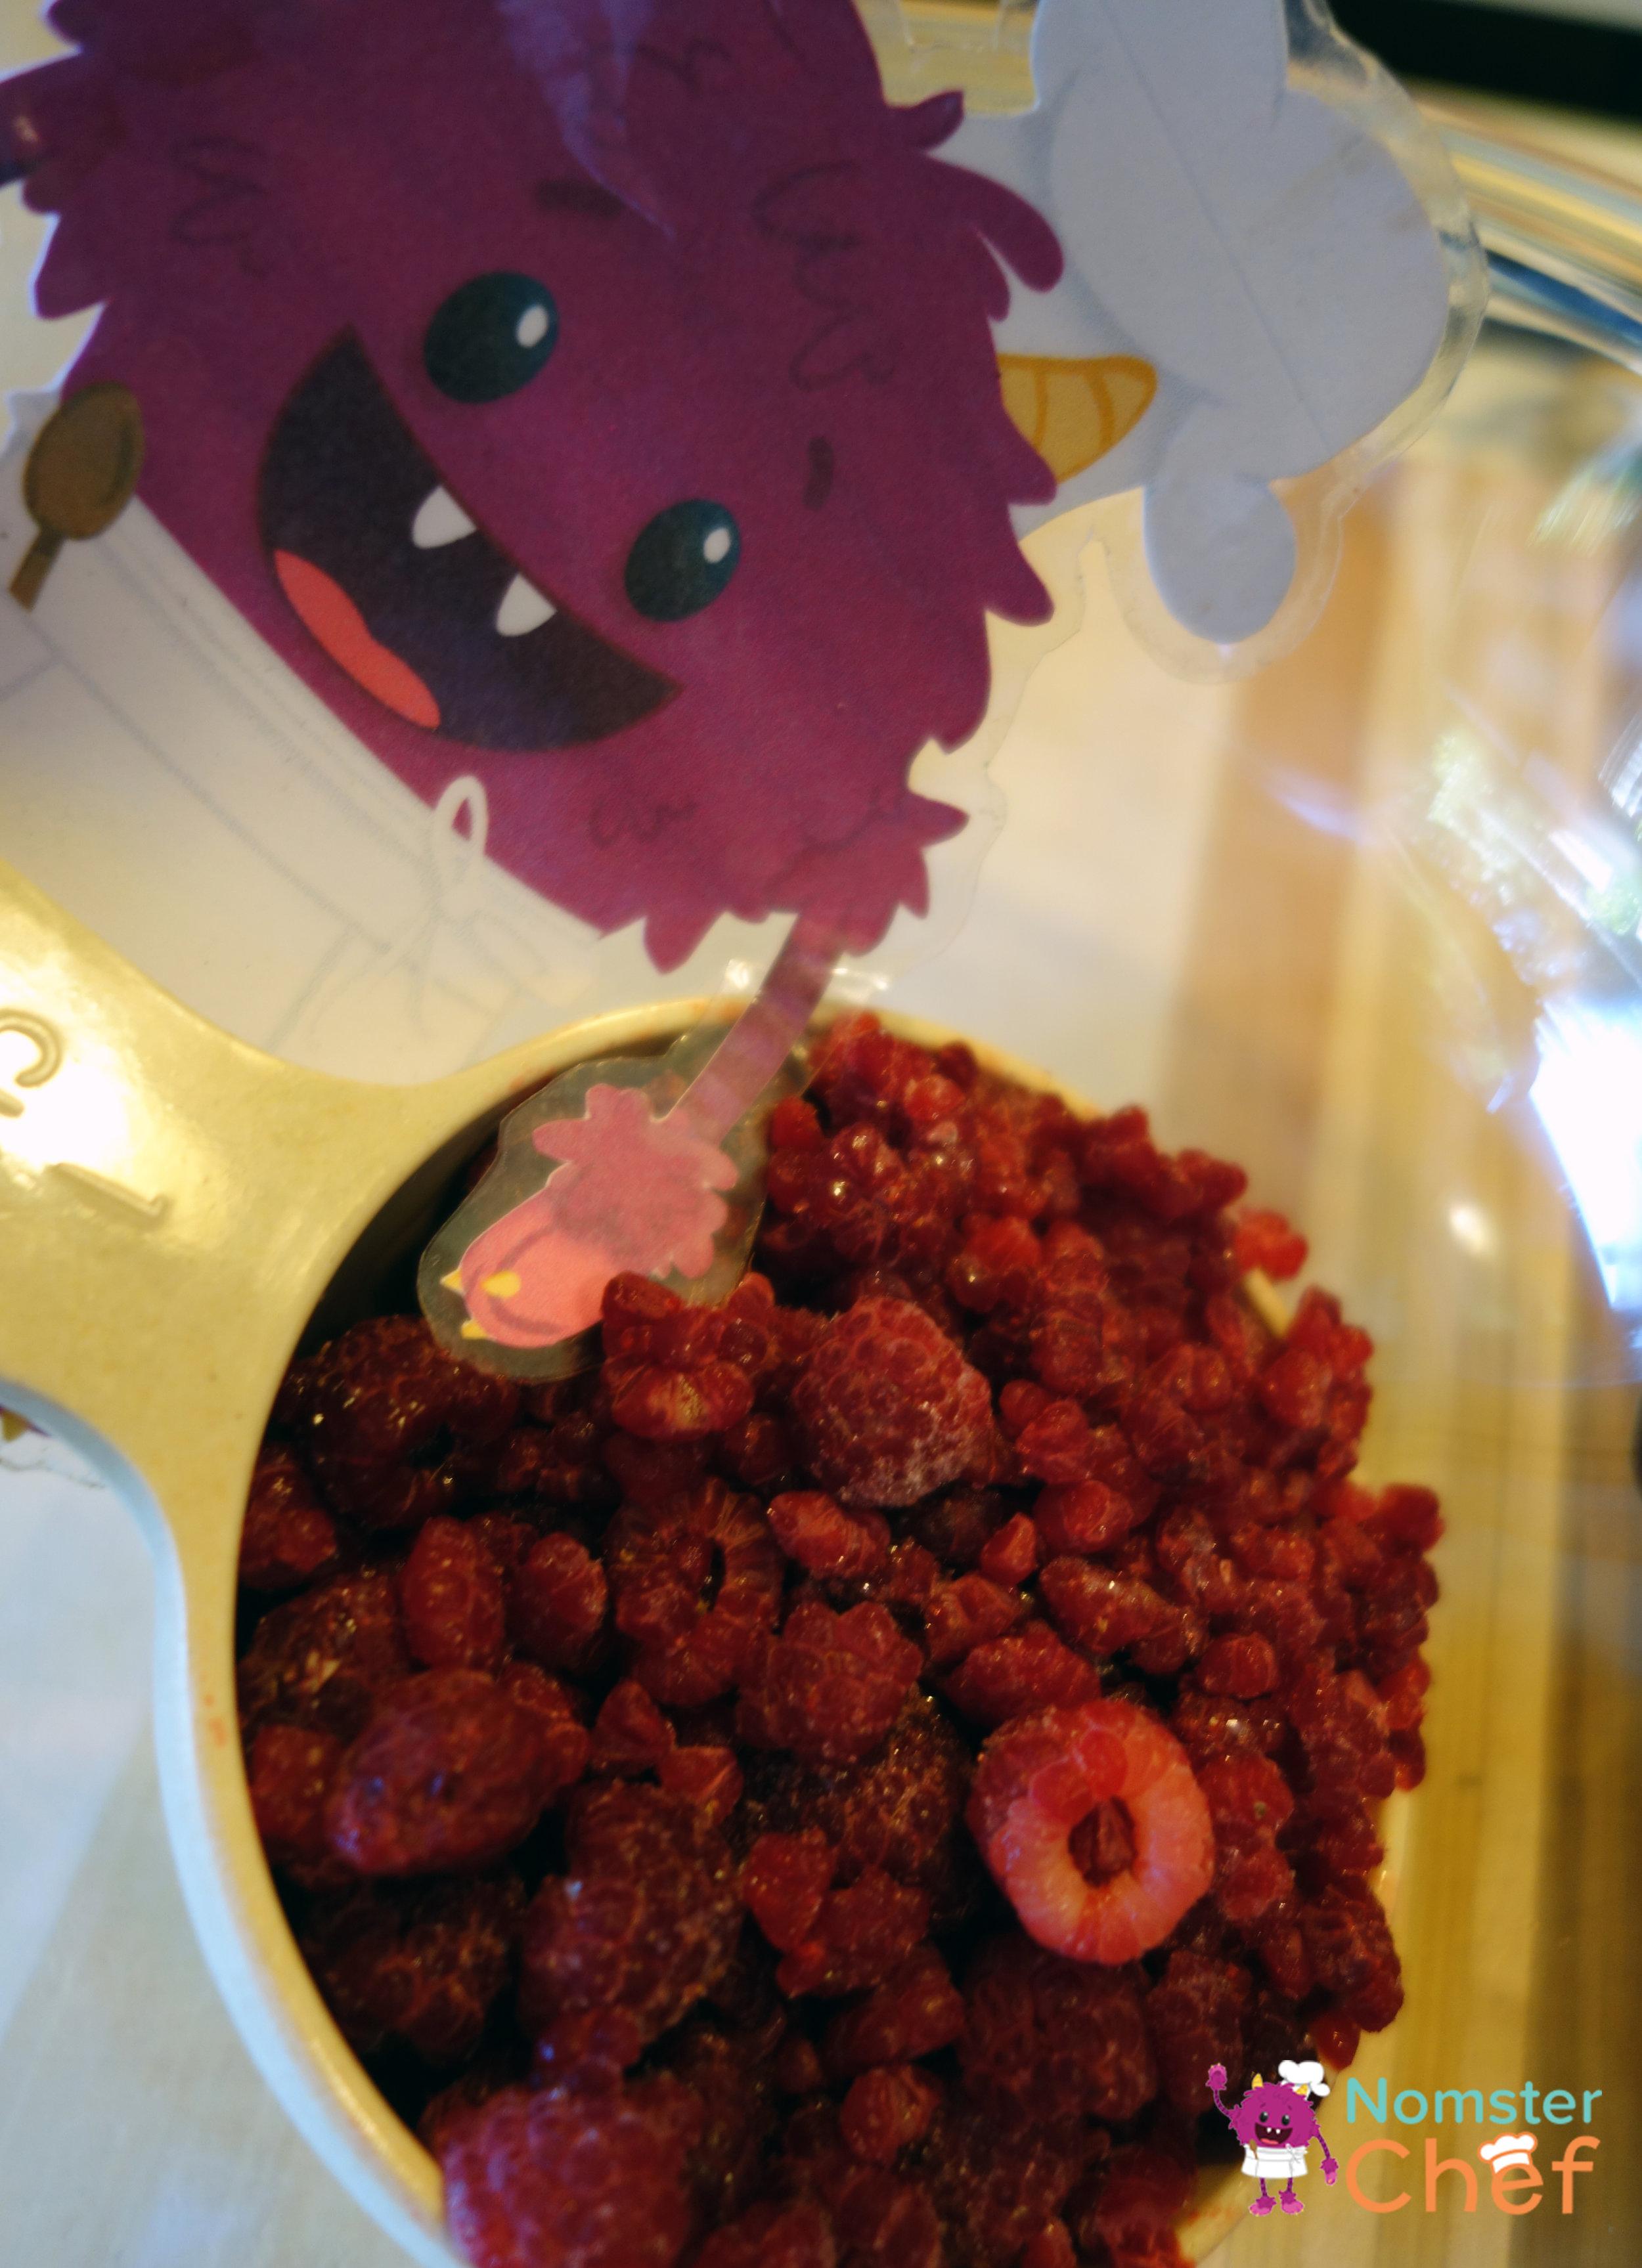 frozen raspberries - raspberry yogurt pops- Nomster Chef